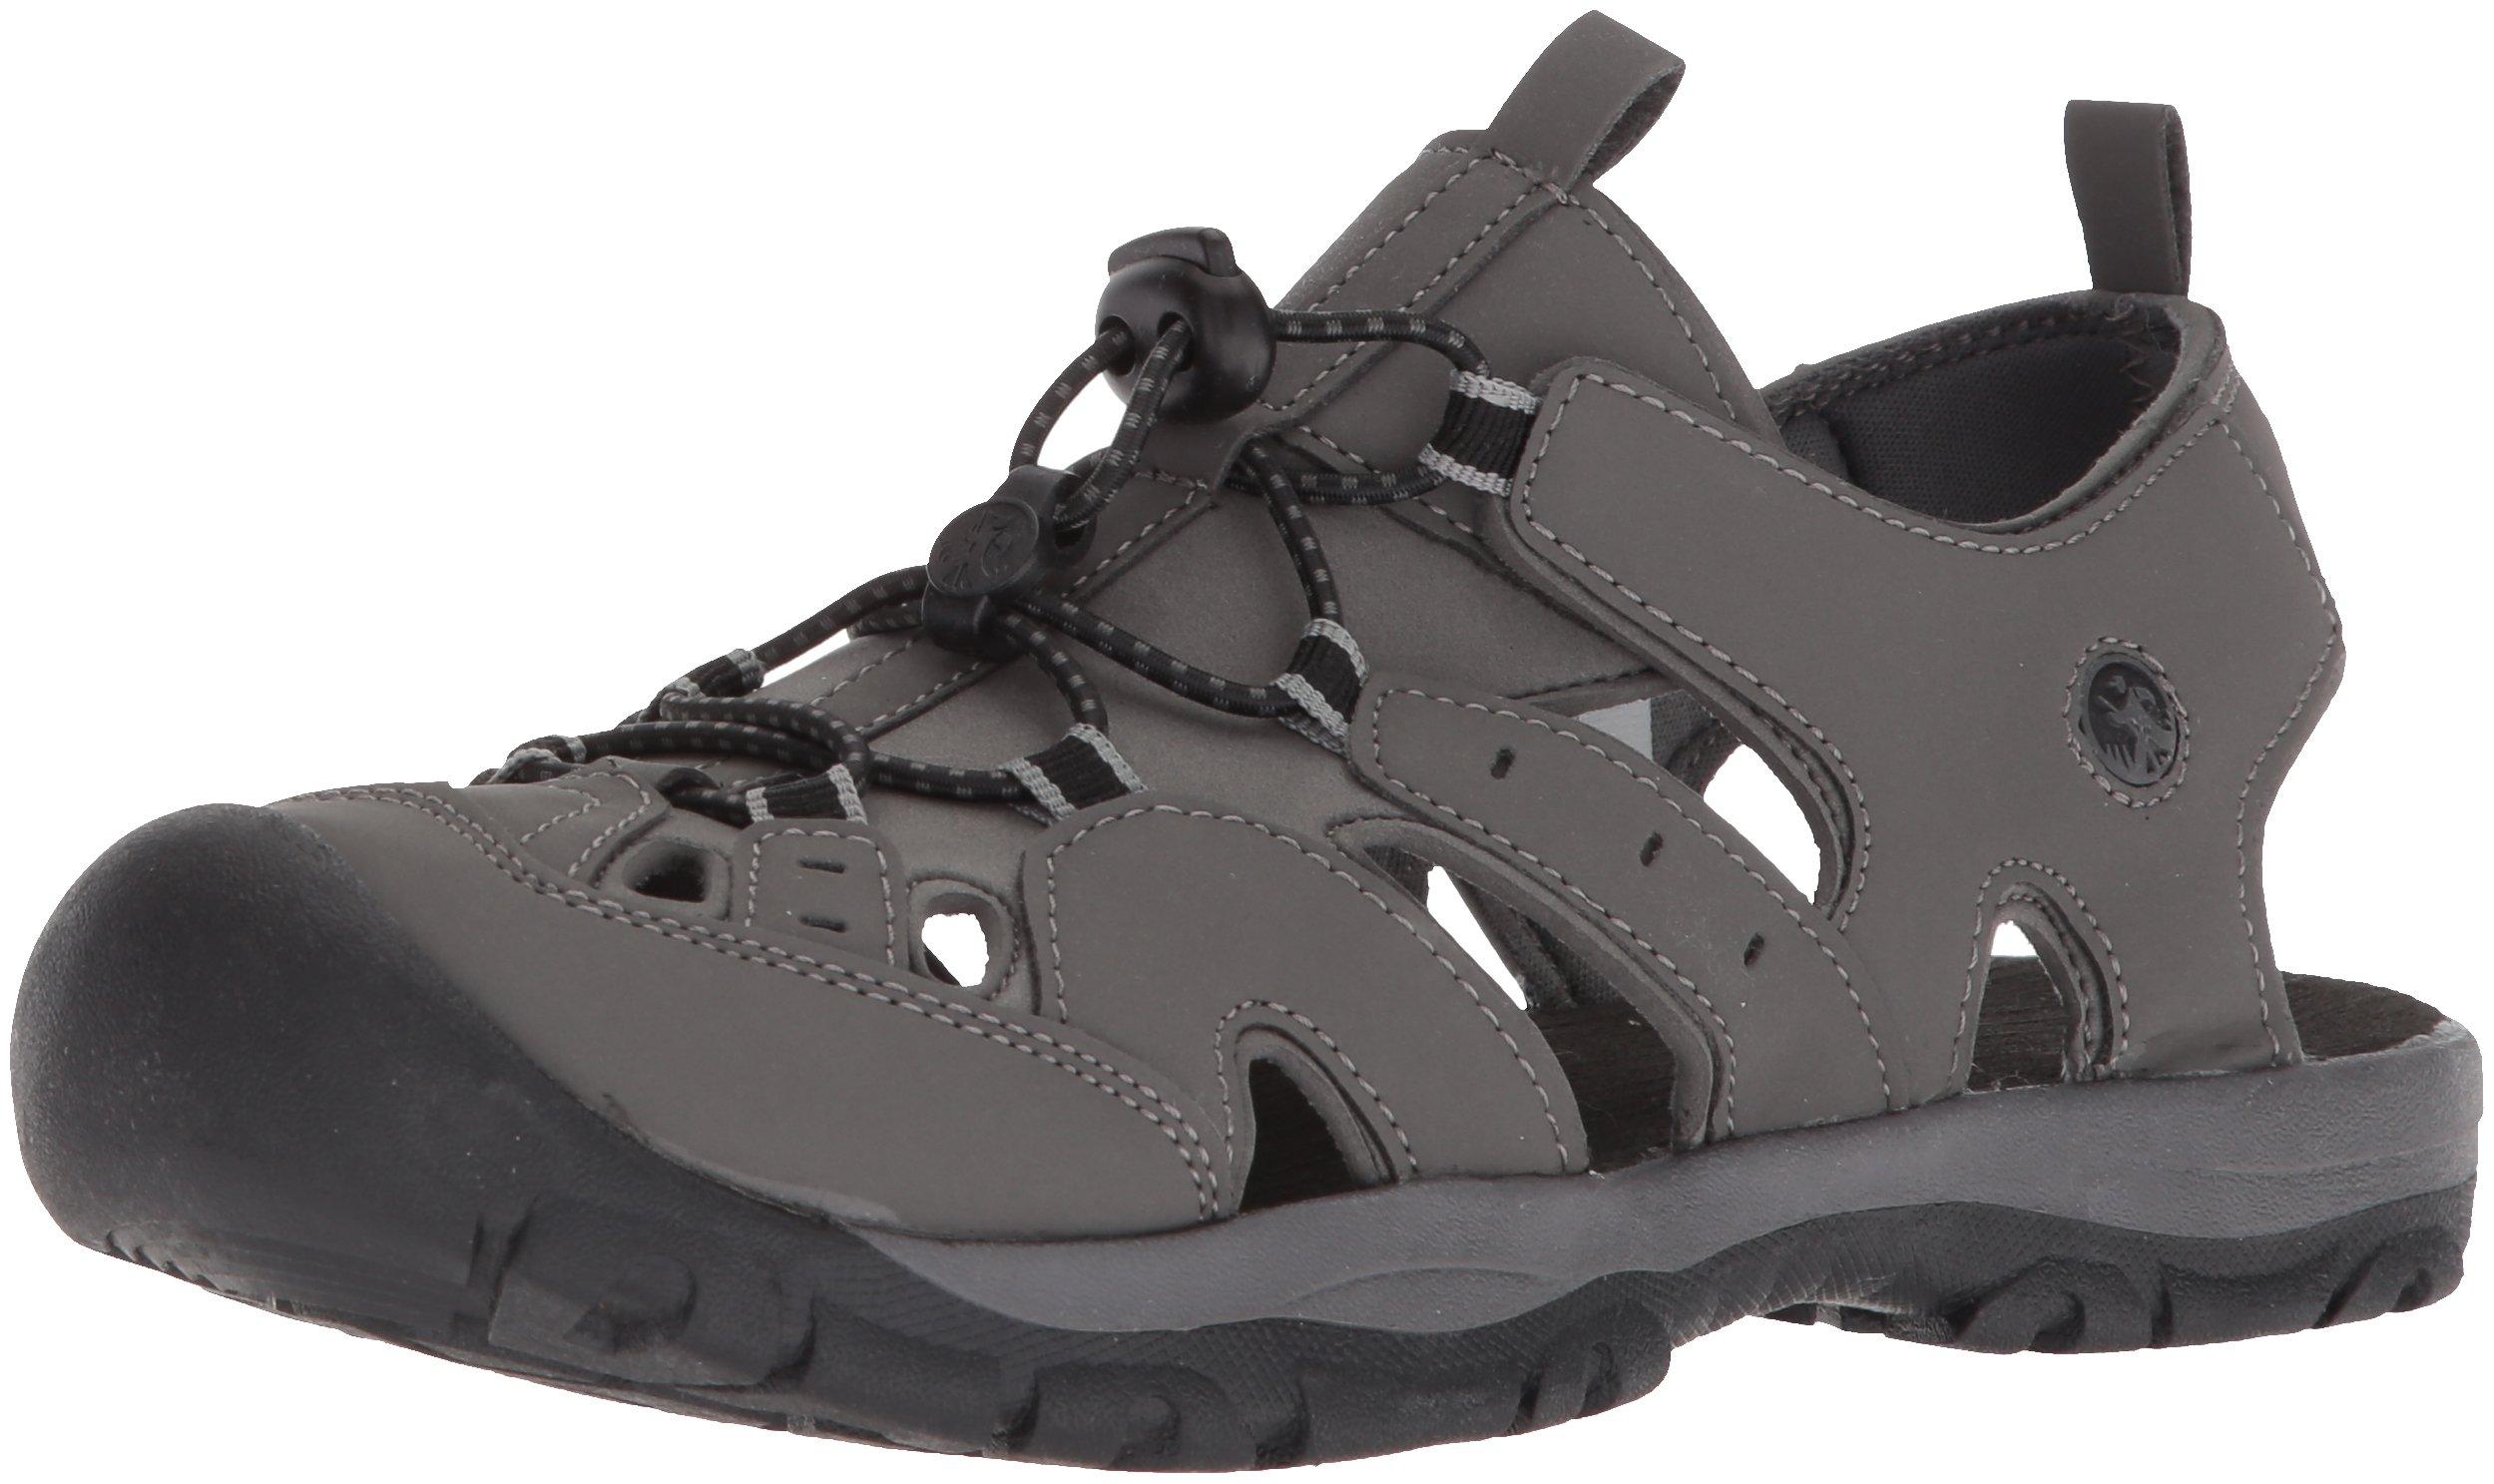 Northside Men's Burke II Sport Sandal, Dark Gray, Size 11 M US by Northside